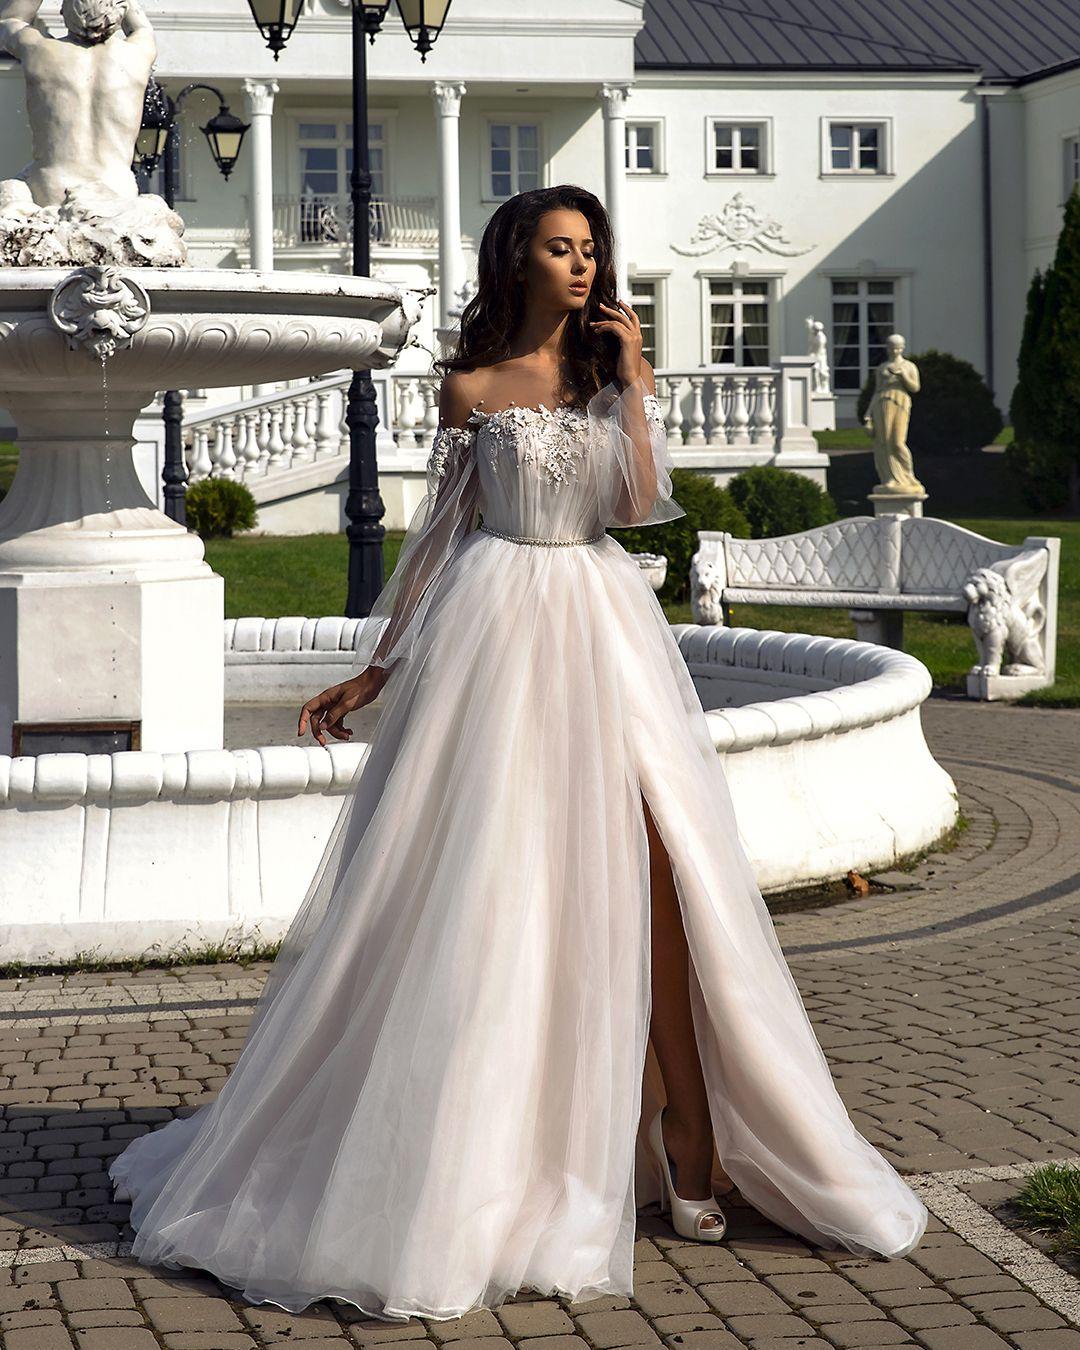 Pin By Alessandra Vernic On C L O T H E S Lace Applique Wedding Dress European Wedding Dresses Wedding Dress Store